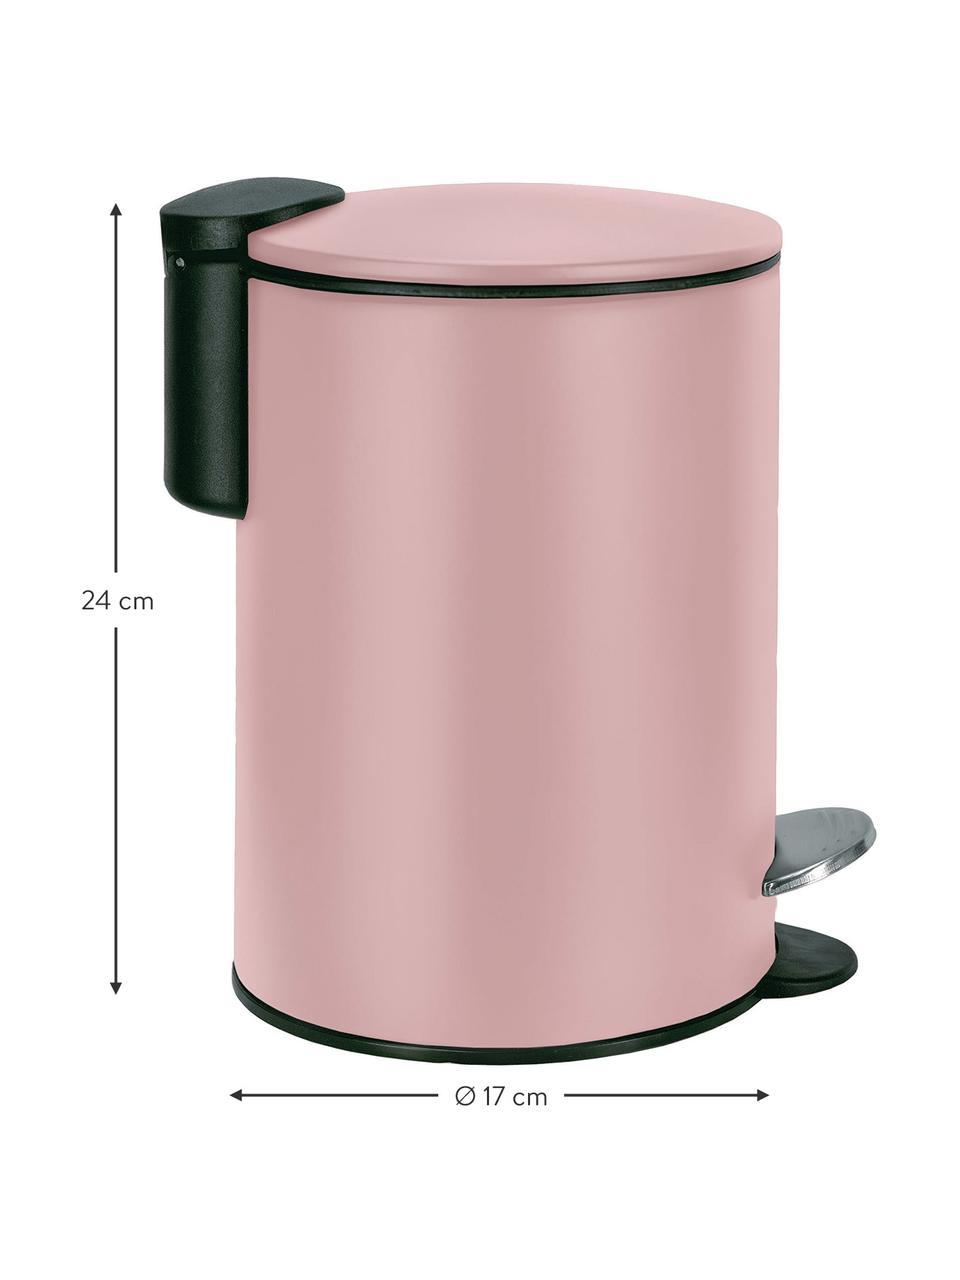 Abfalleimer Silence mit Pedalfunktion, Metall, lackiert, Rosa, Ø 17 x H 24 cm